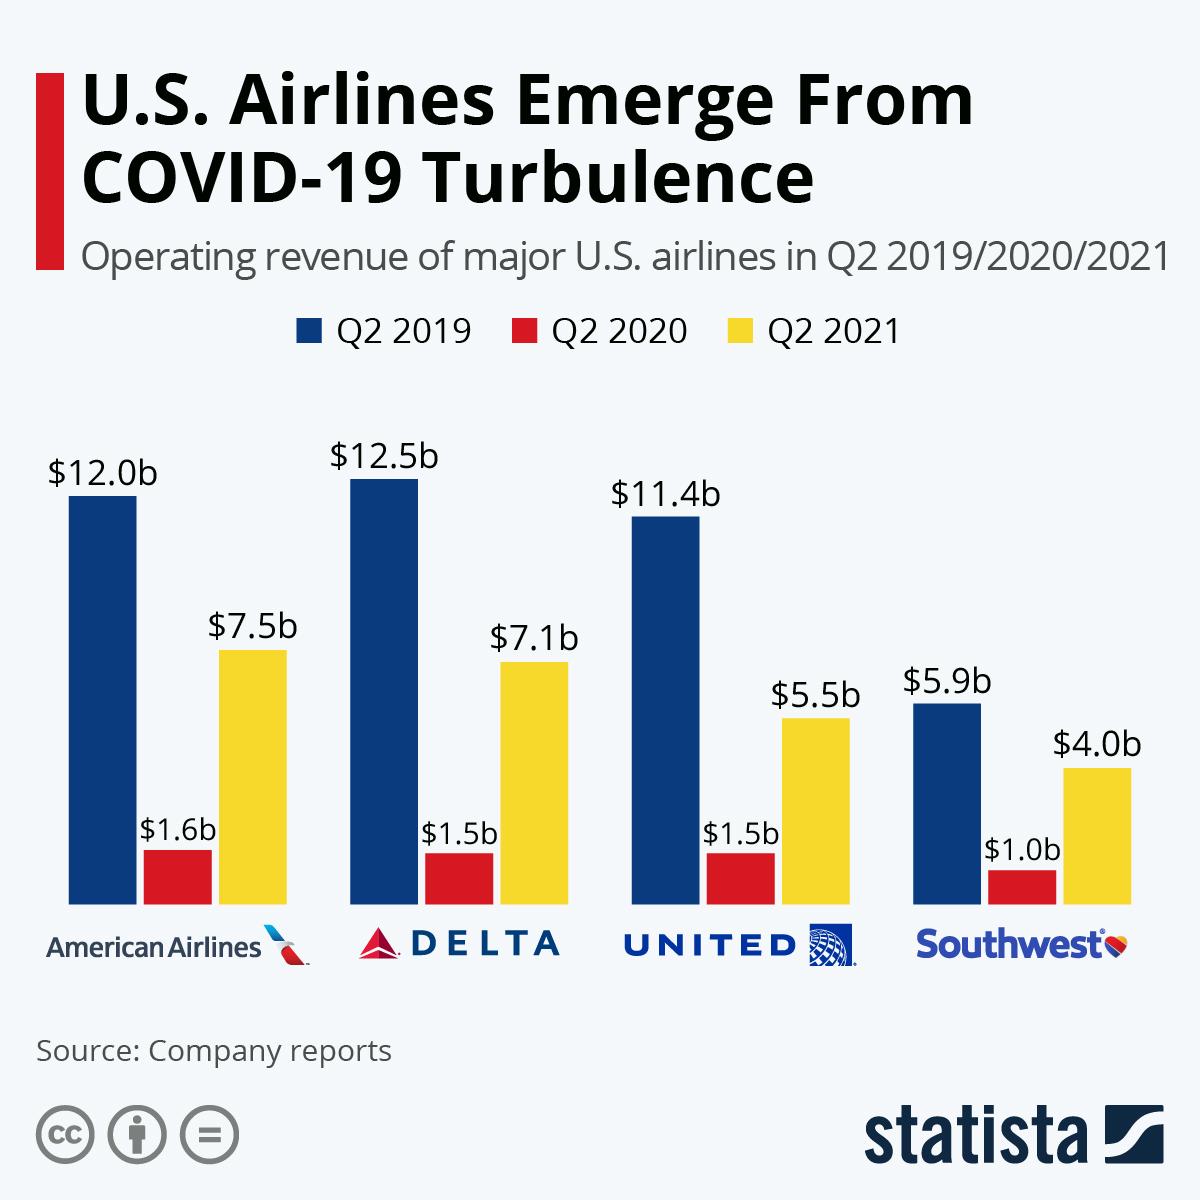 U.S. Airlines Hit Turbulence Amid COVID-19 Pandemic